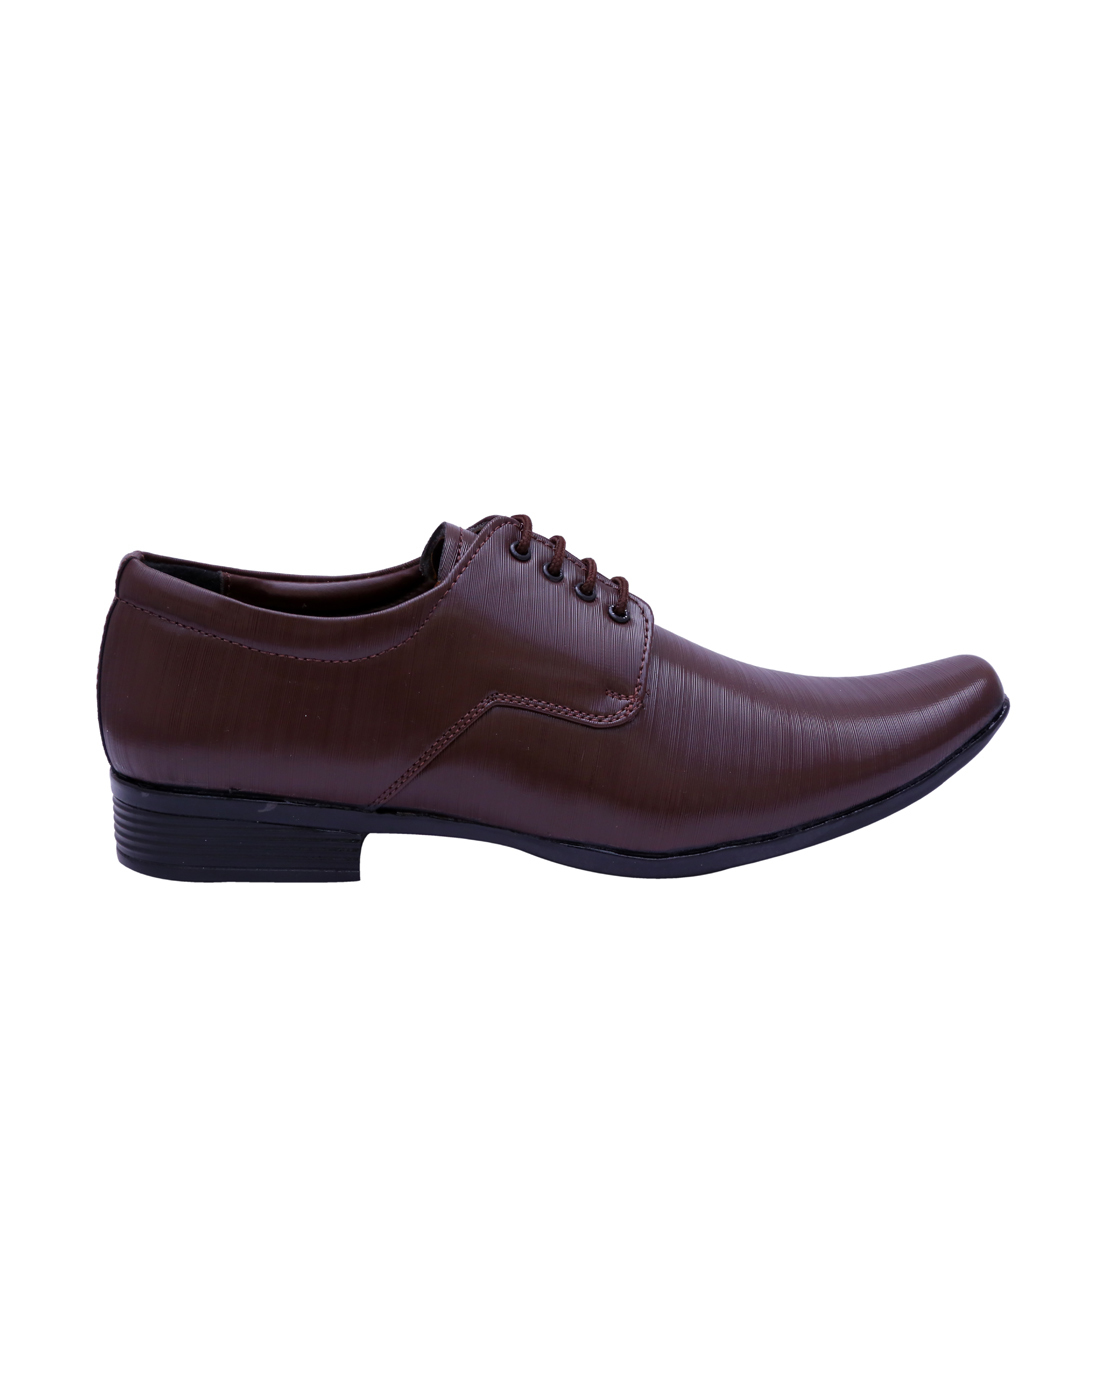 formal office wear shoes for men's